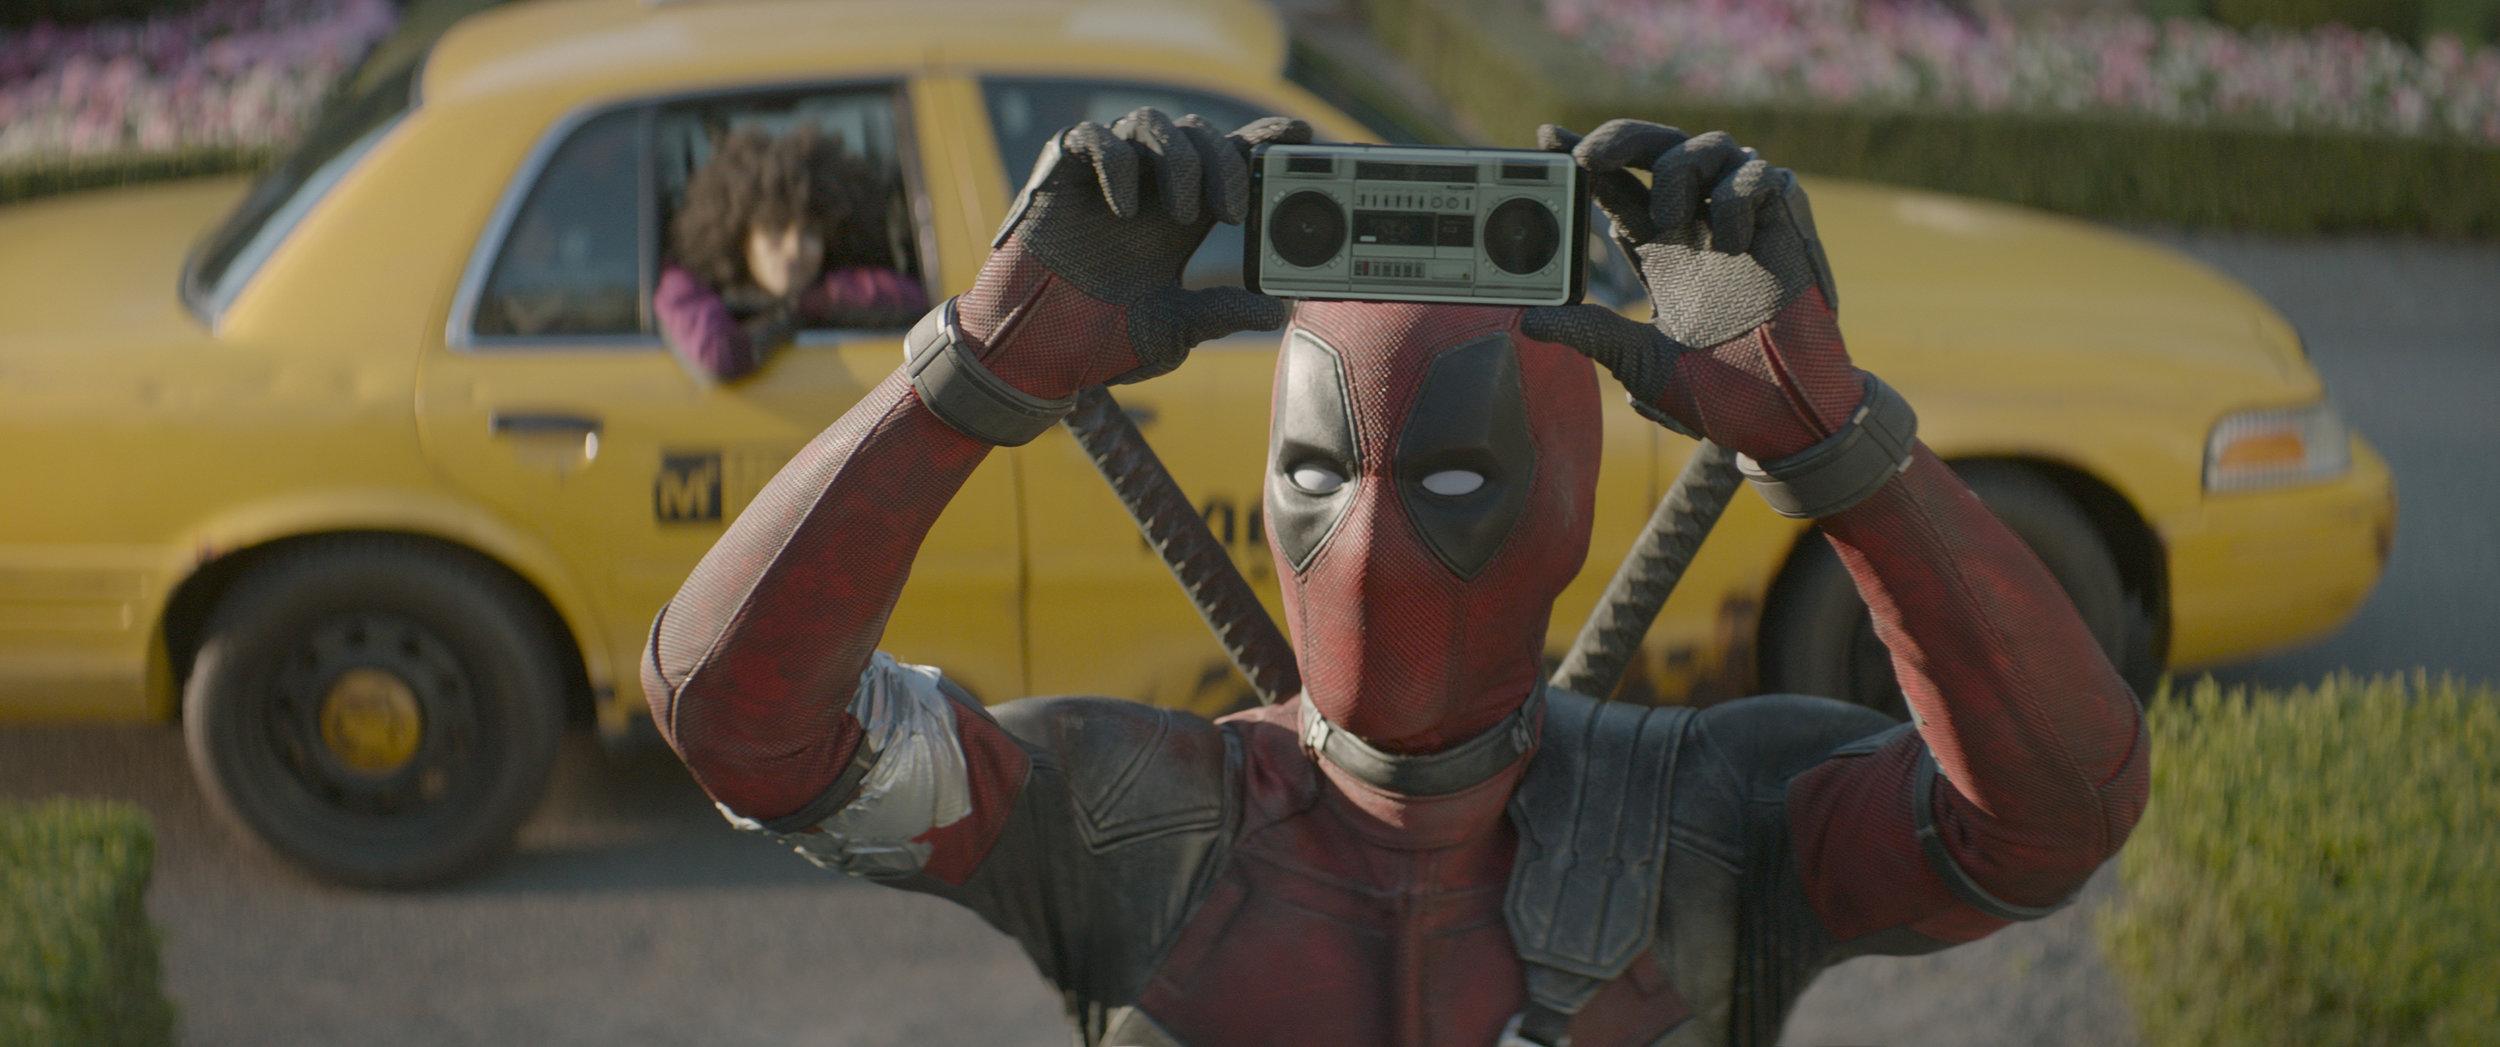 (Image courtesy of Twentieth Century Fox via EPK.tv)